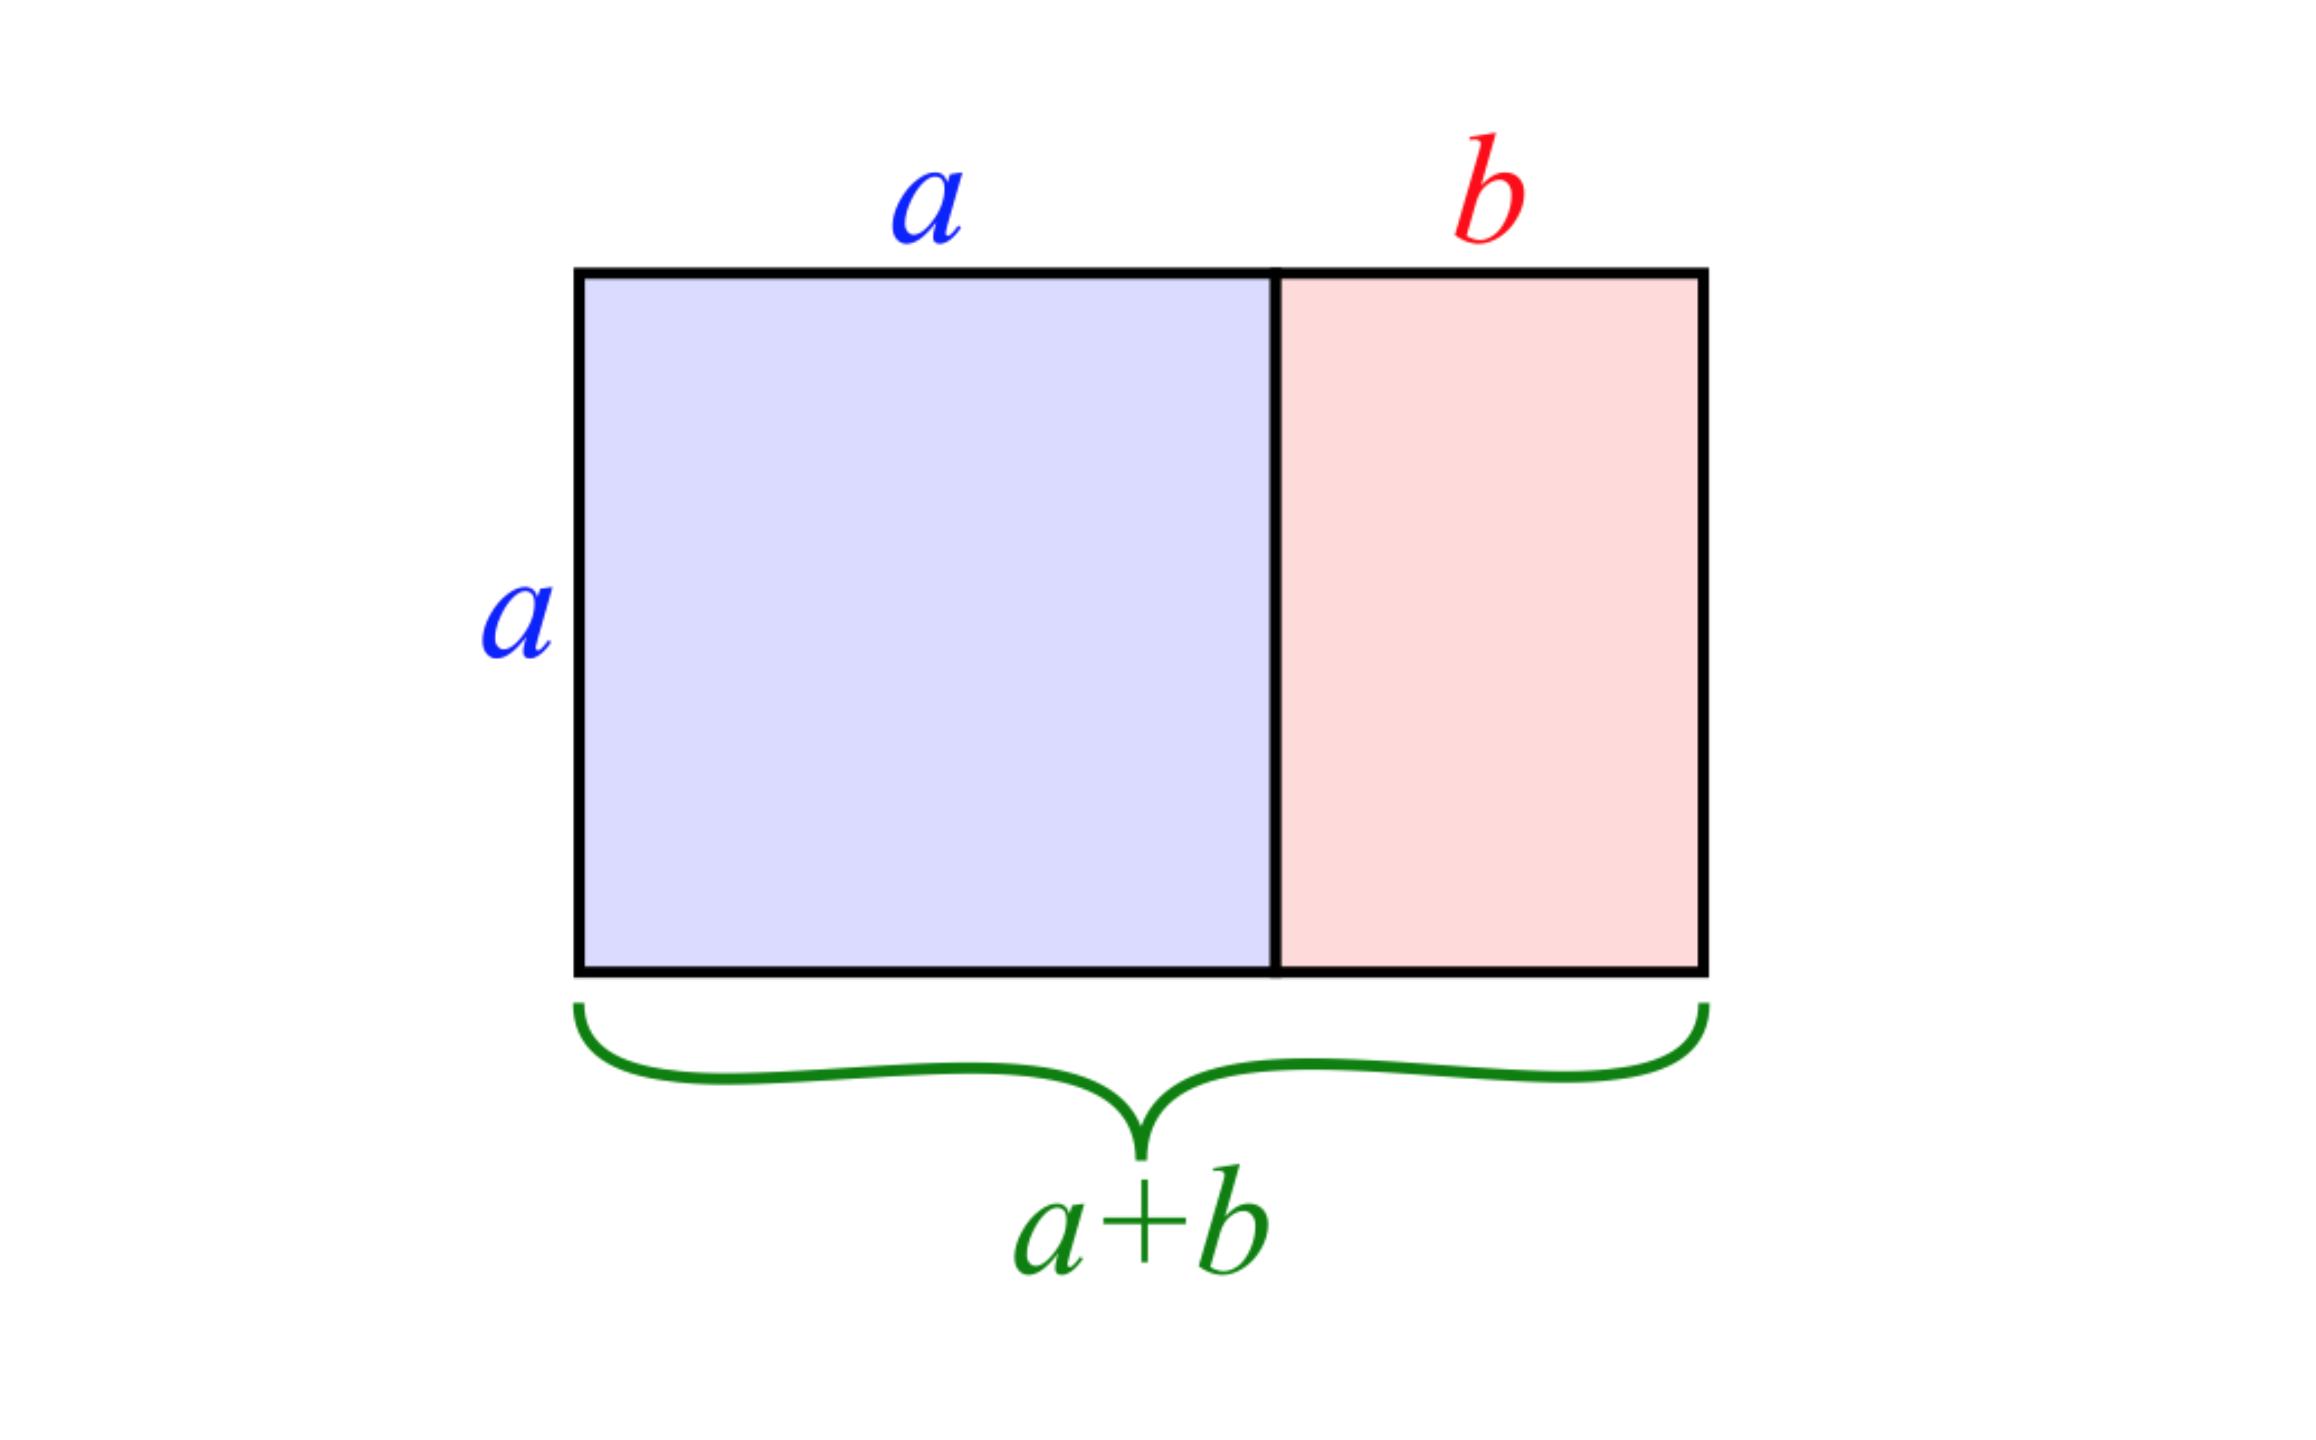 Illustration of the golden rectangle